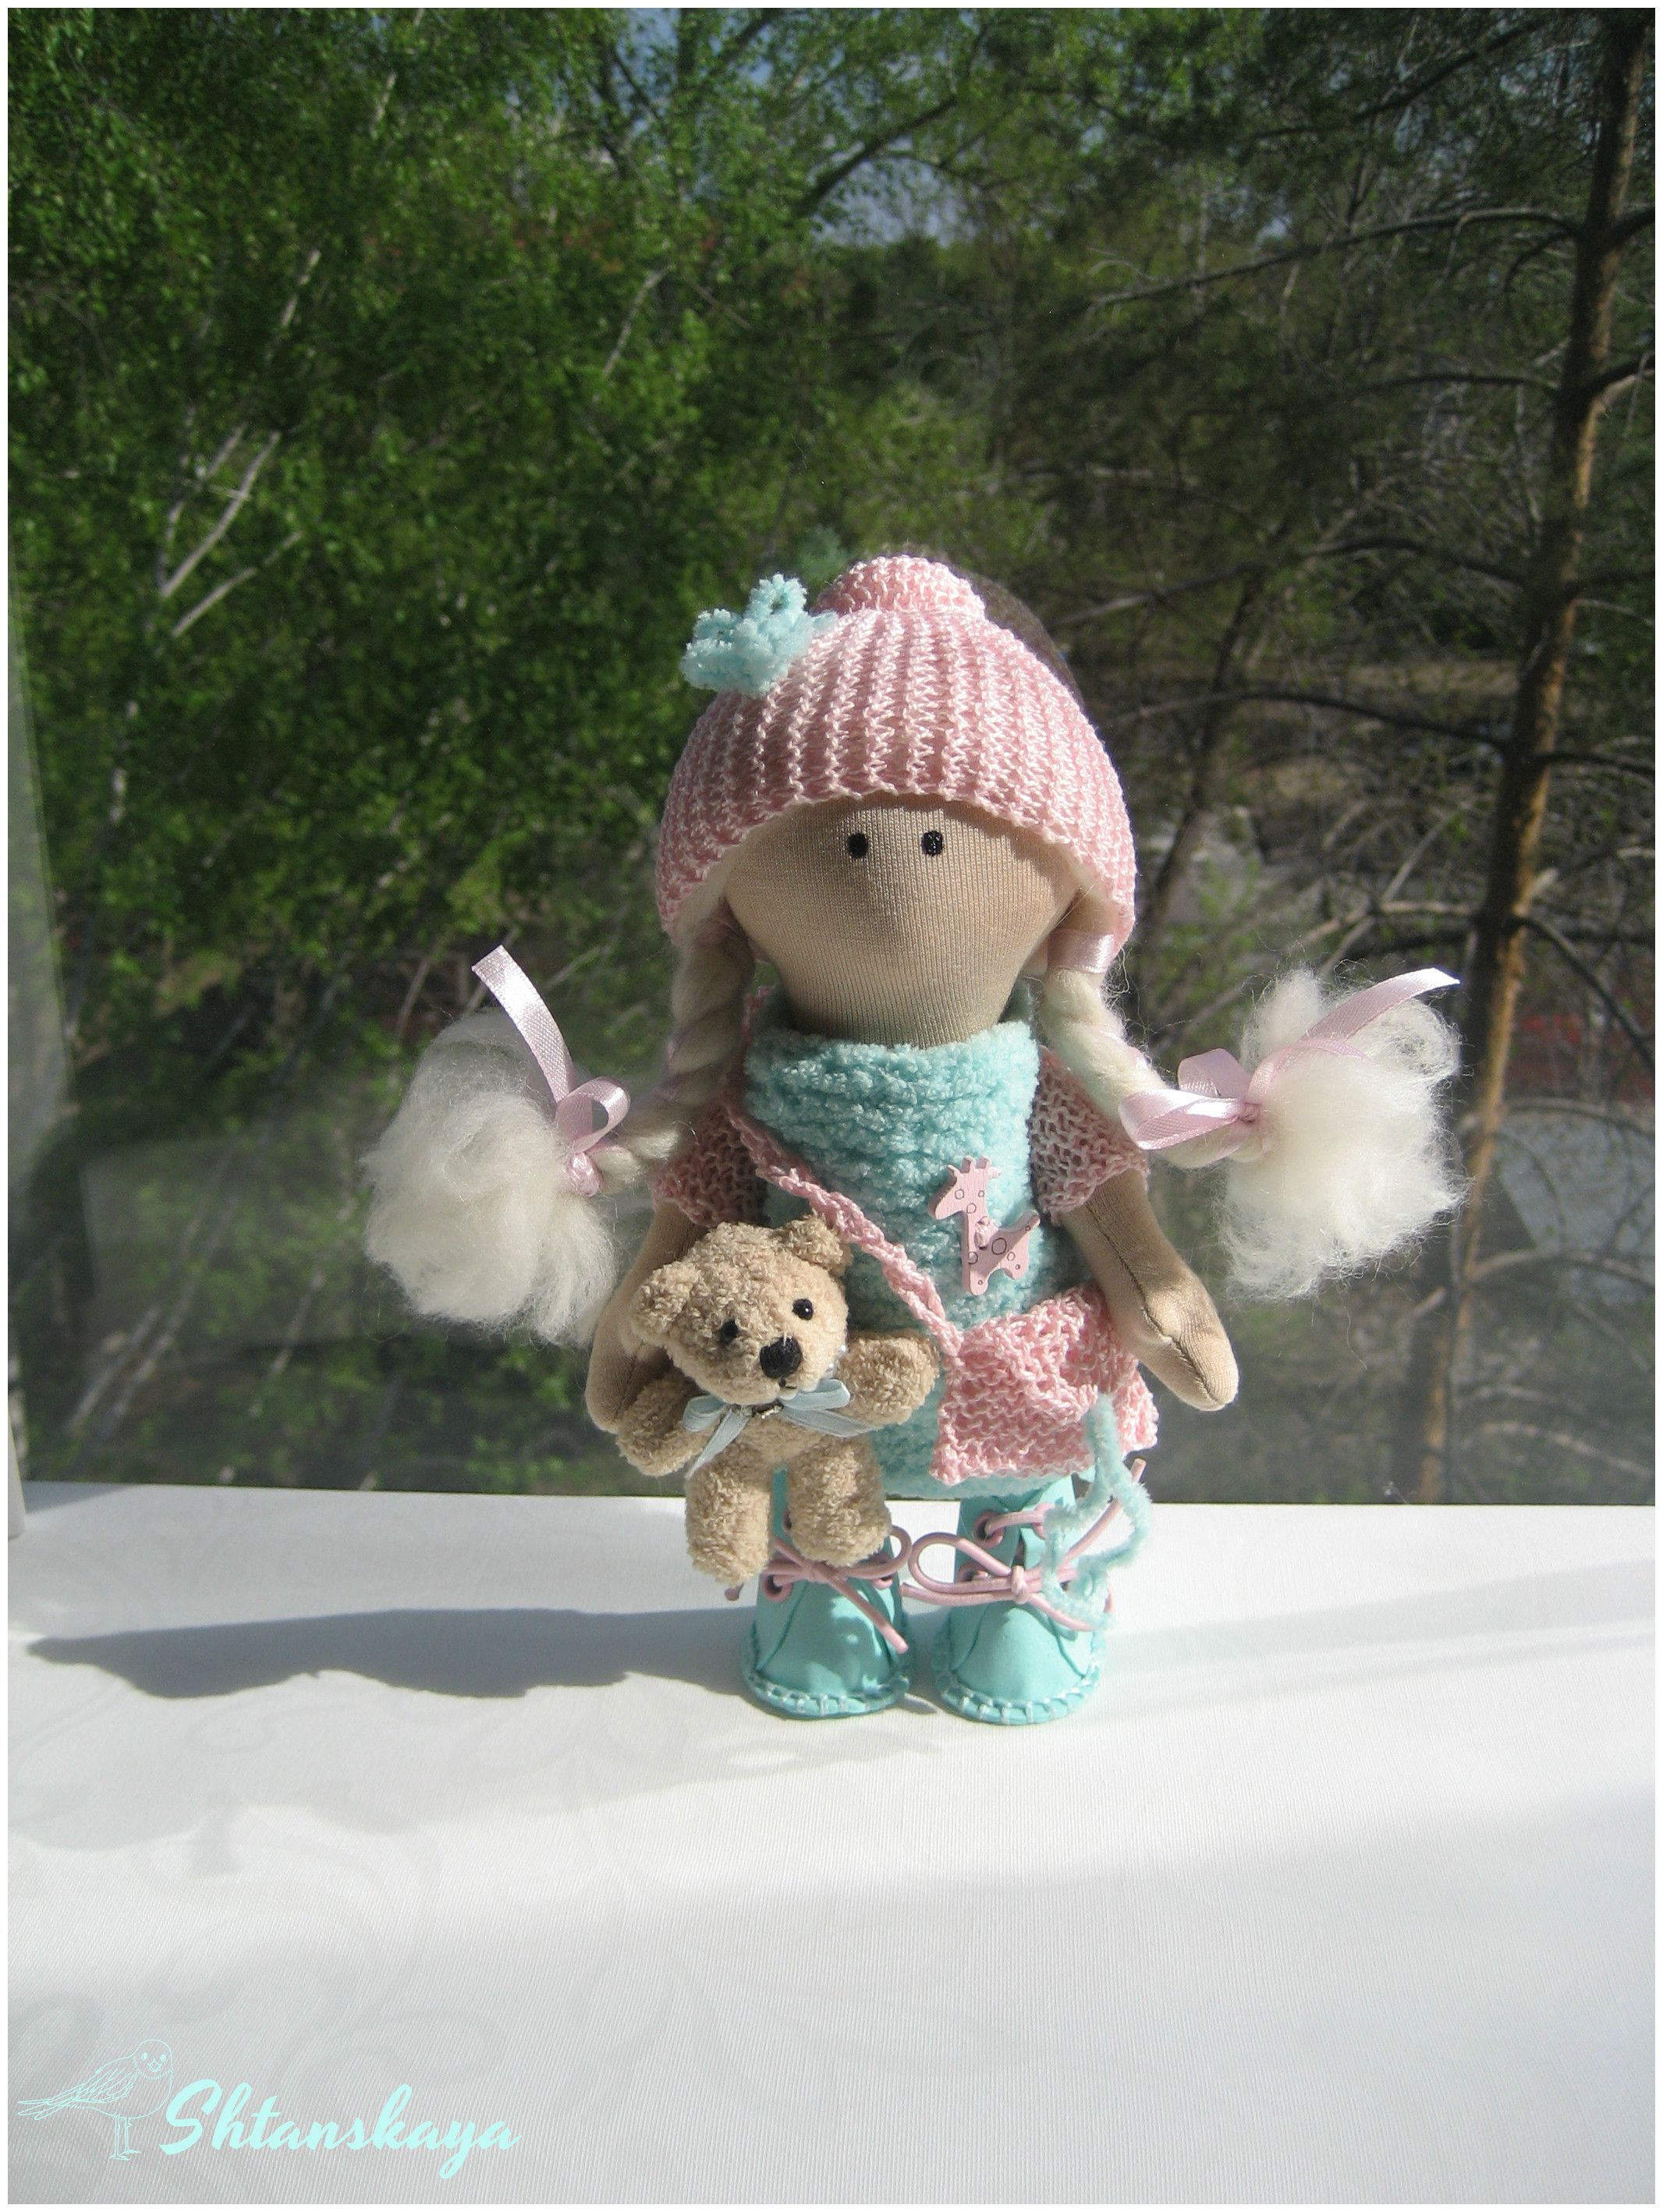 ручнаяработа dolls кукла сувенир handmade интерьернаякукла подарки дети